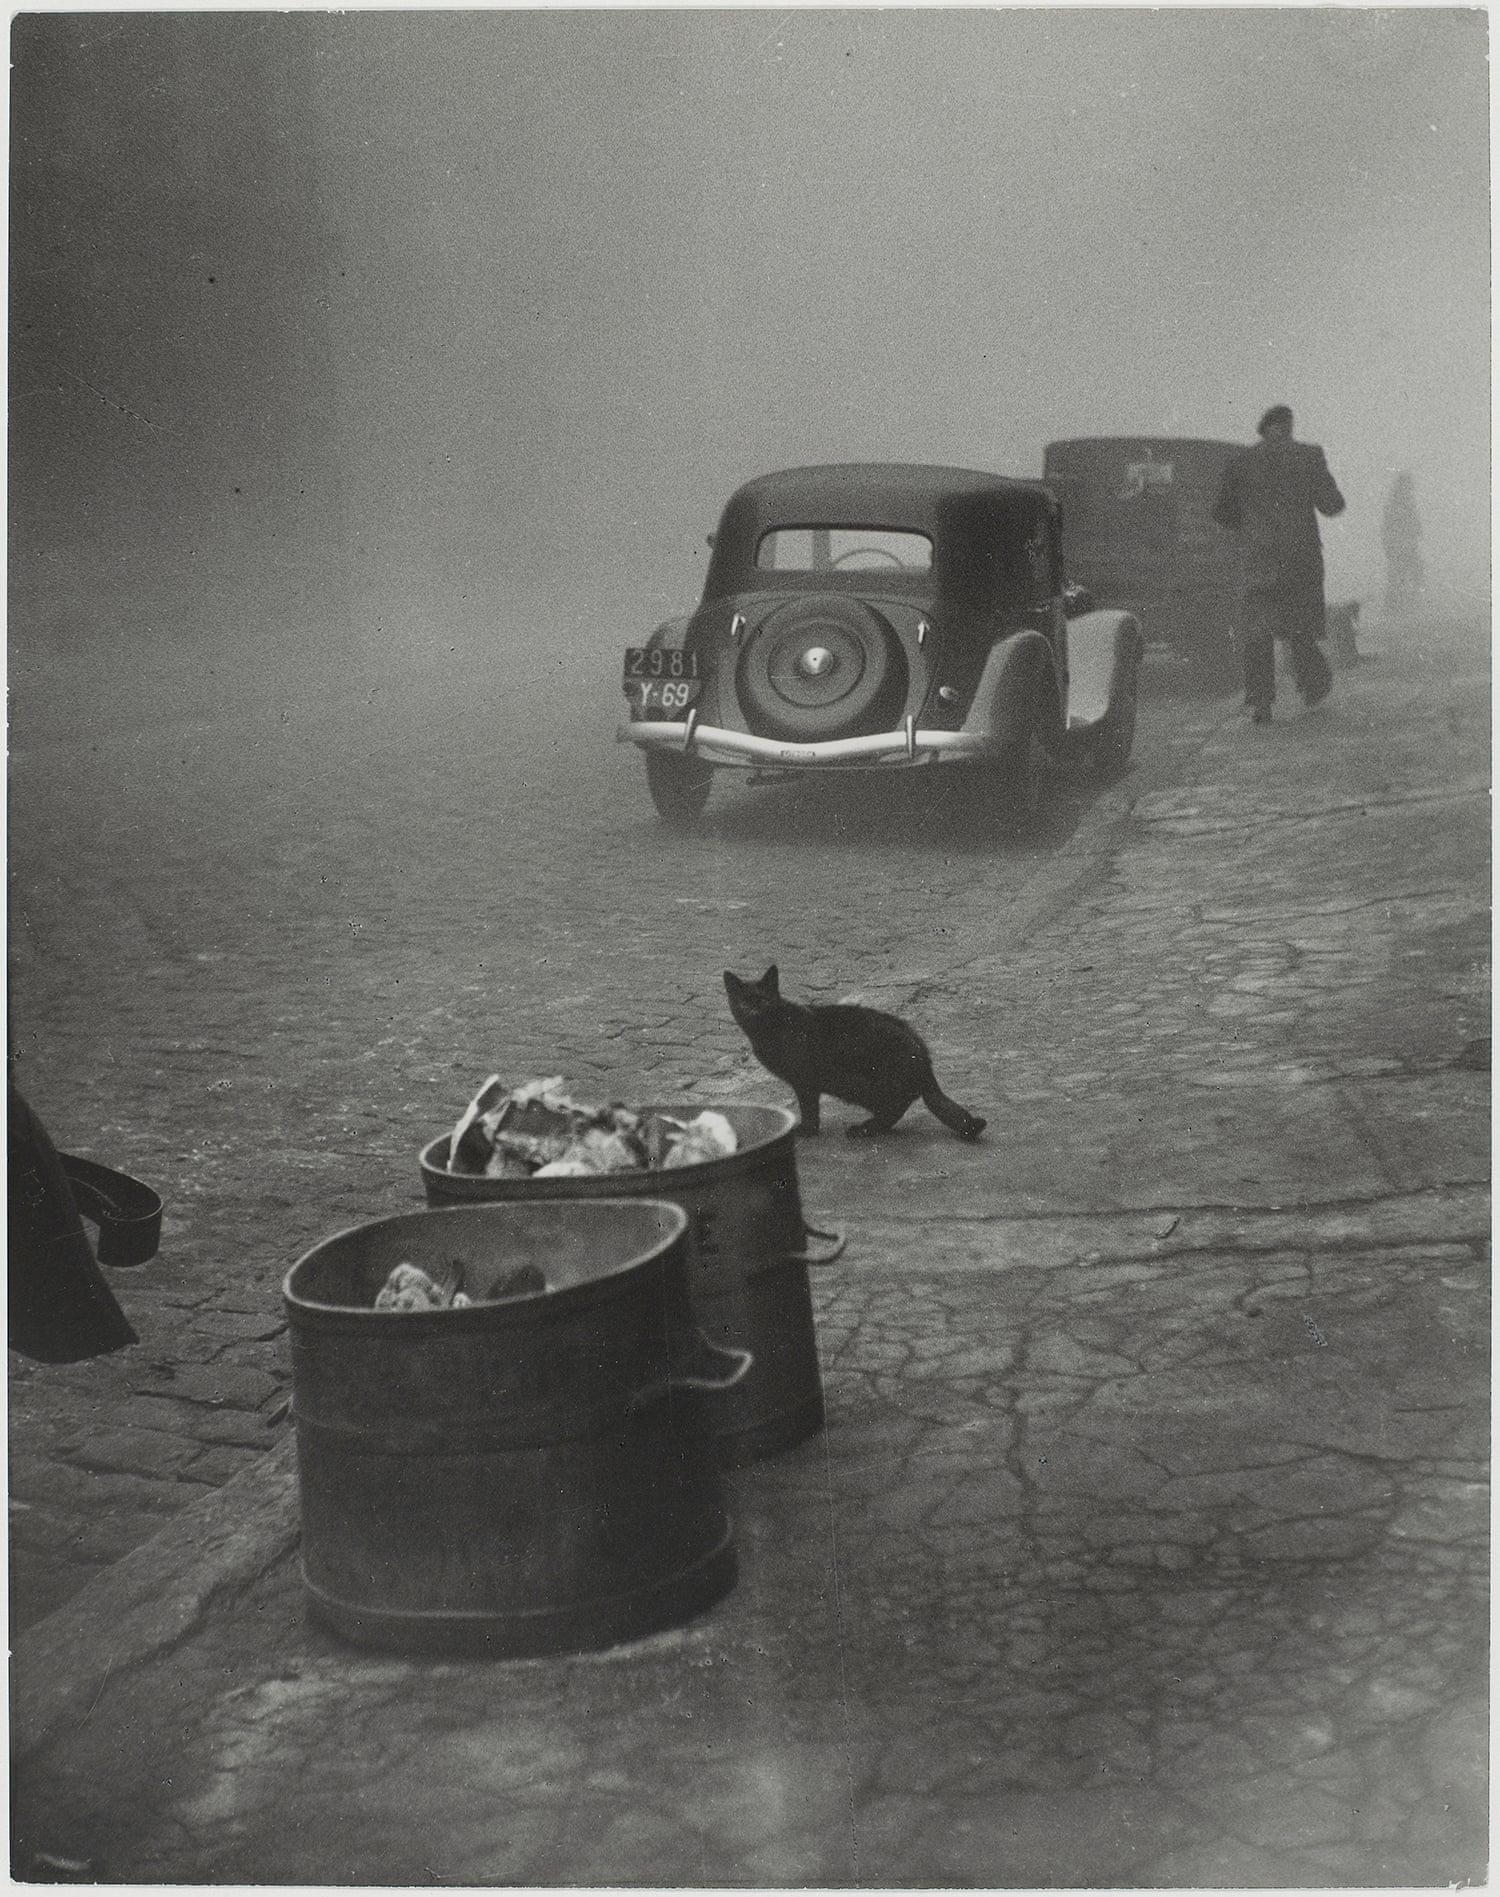 Fotó: Sabine Weiss: Petit matin brumeux, Lyon, France, 1950. Photograph: Sabine Weiss/Centre Pompidou, MNAM-CCI/Philippe Migeat/Dist RMN-GP